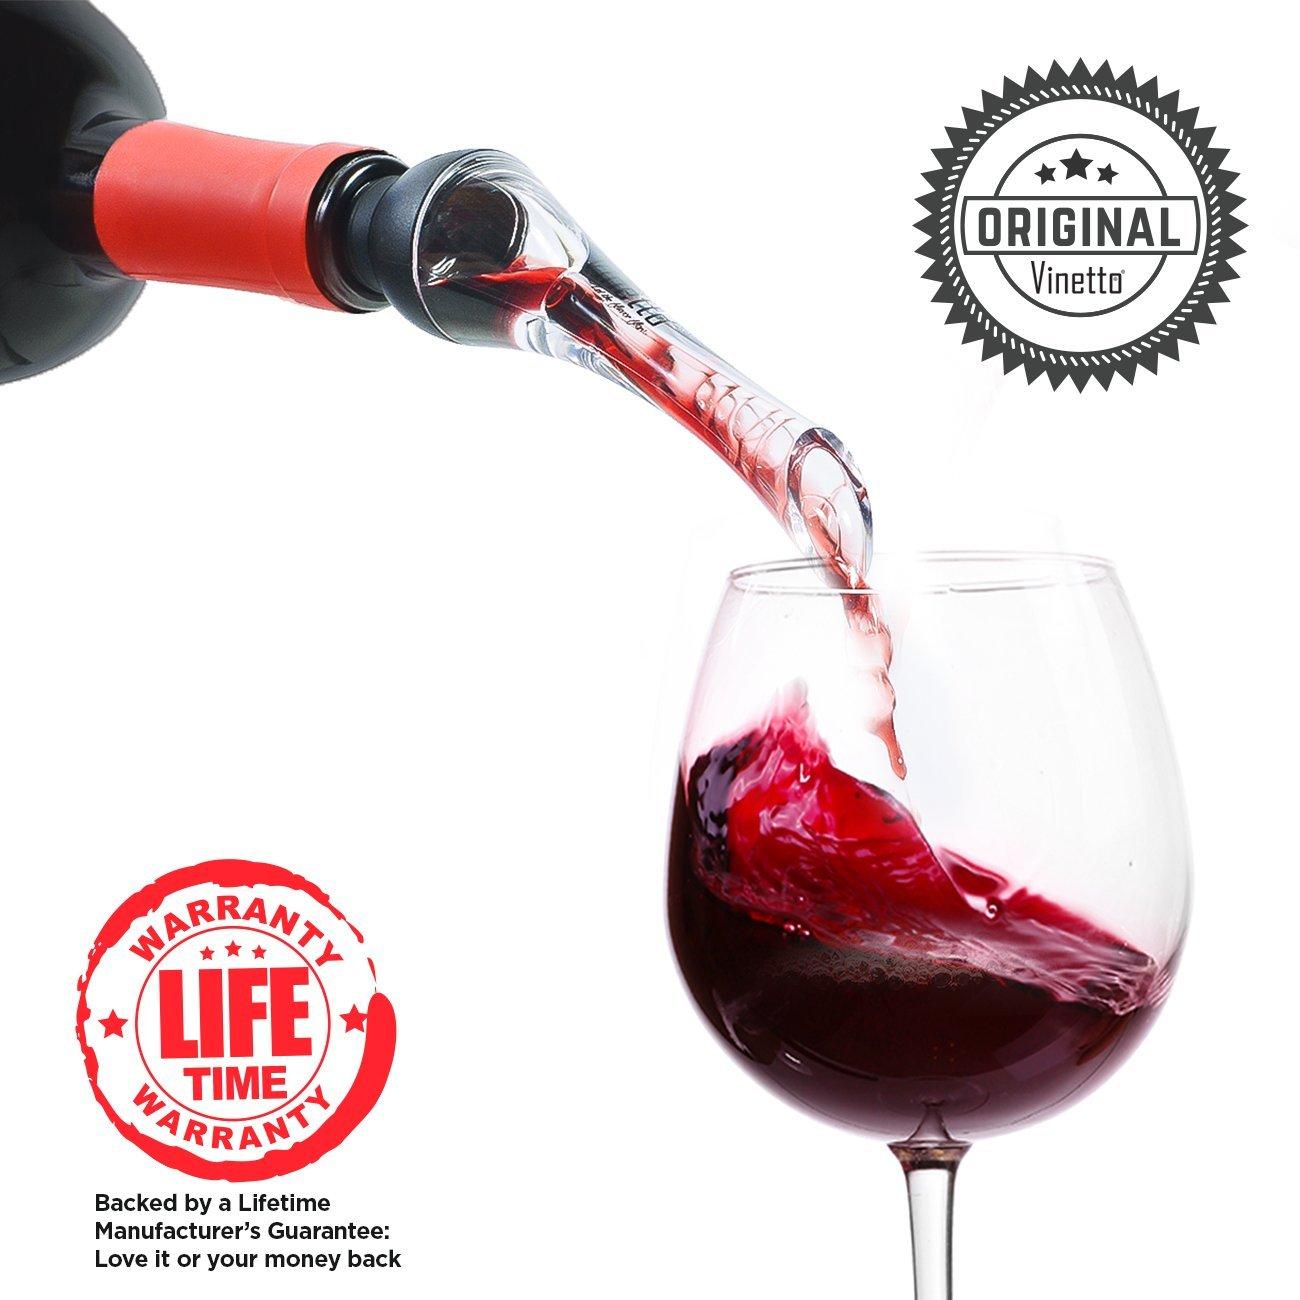 Vinetto Original Red Wine Aerator and Decanter Spout-Best Aerating Pourer-Bottle Top Air Funnel for Superior Aeration-Elegant & Ergonomic Design-Black